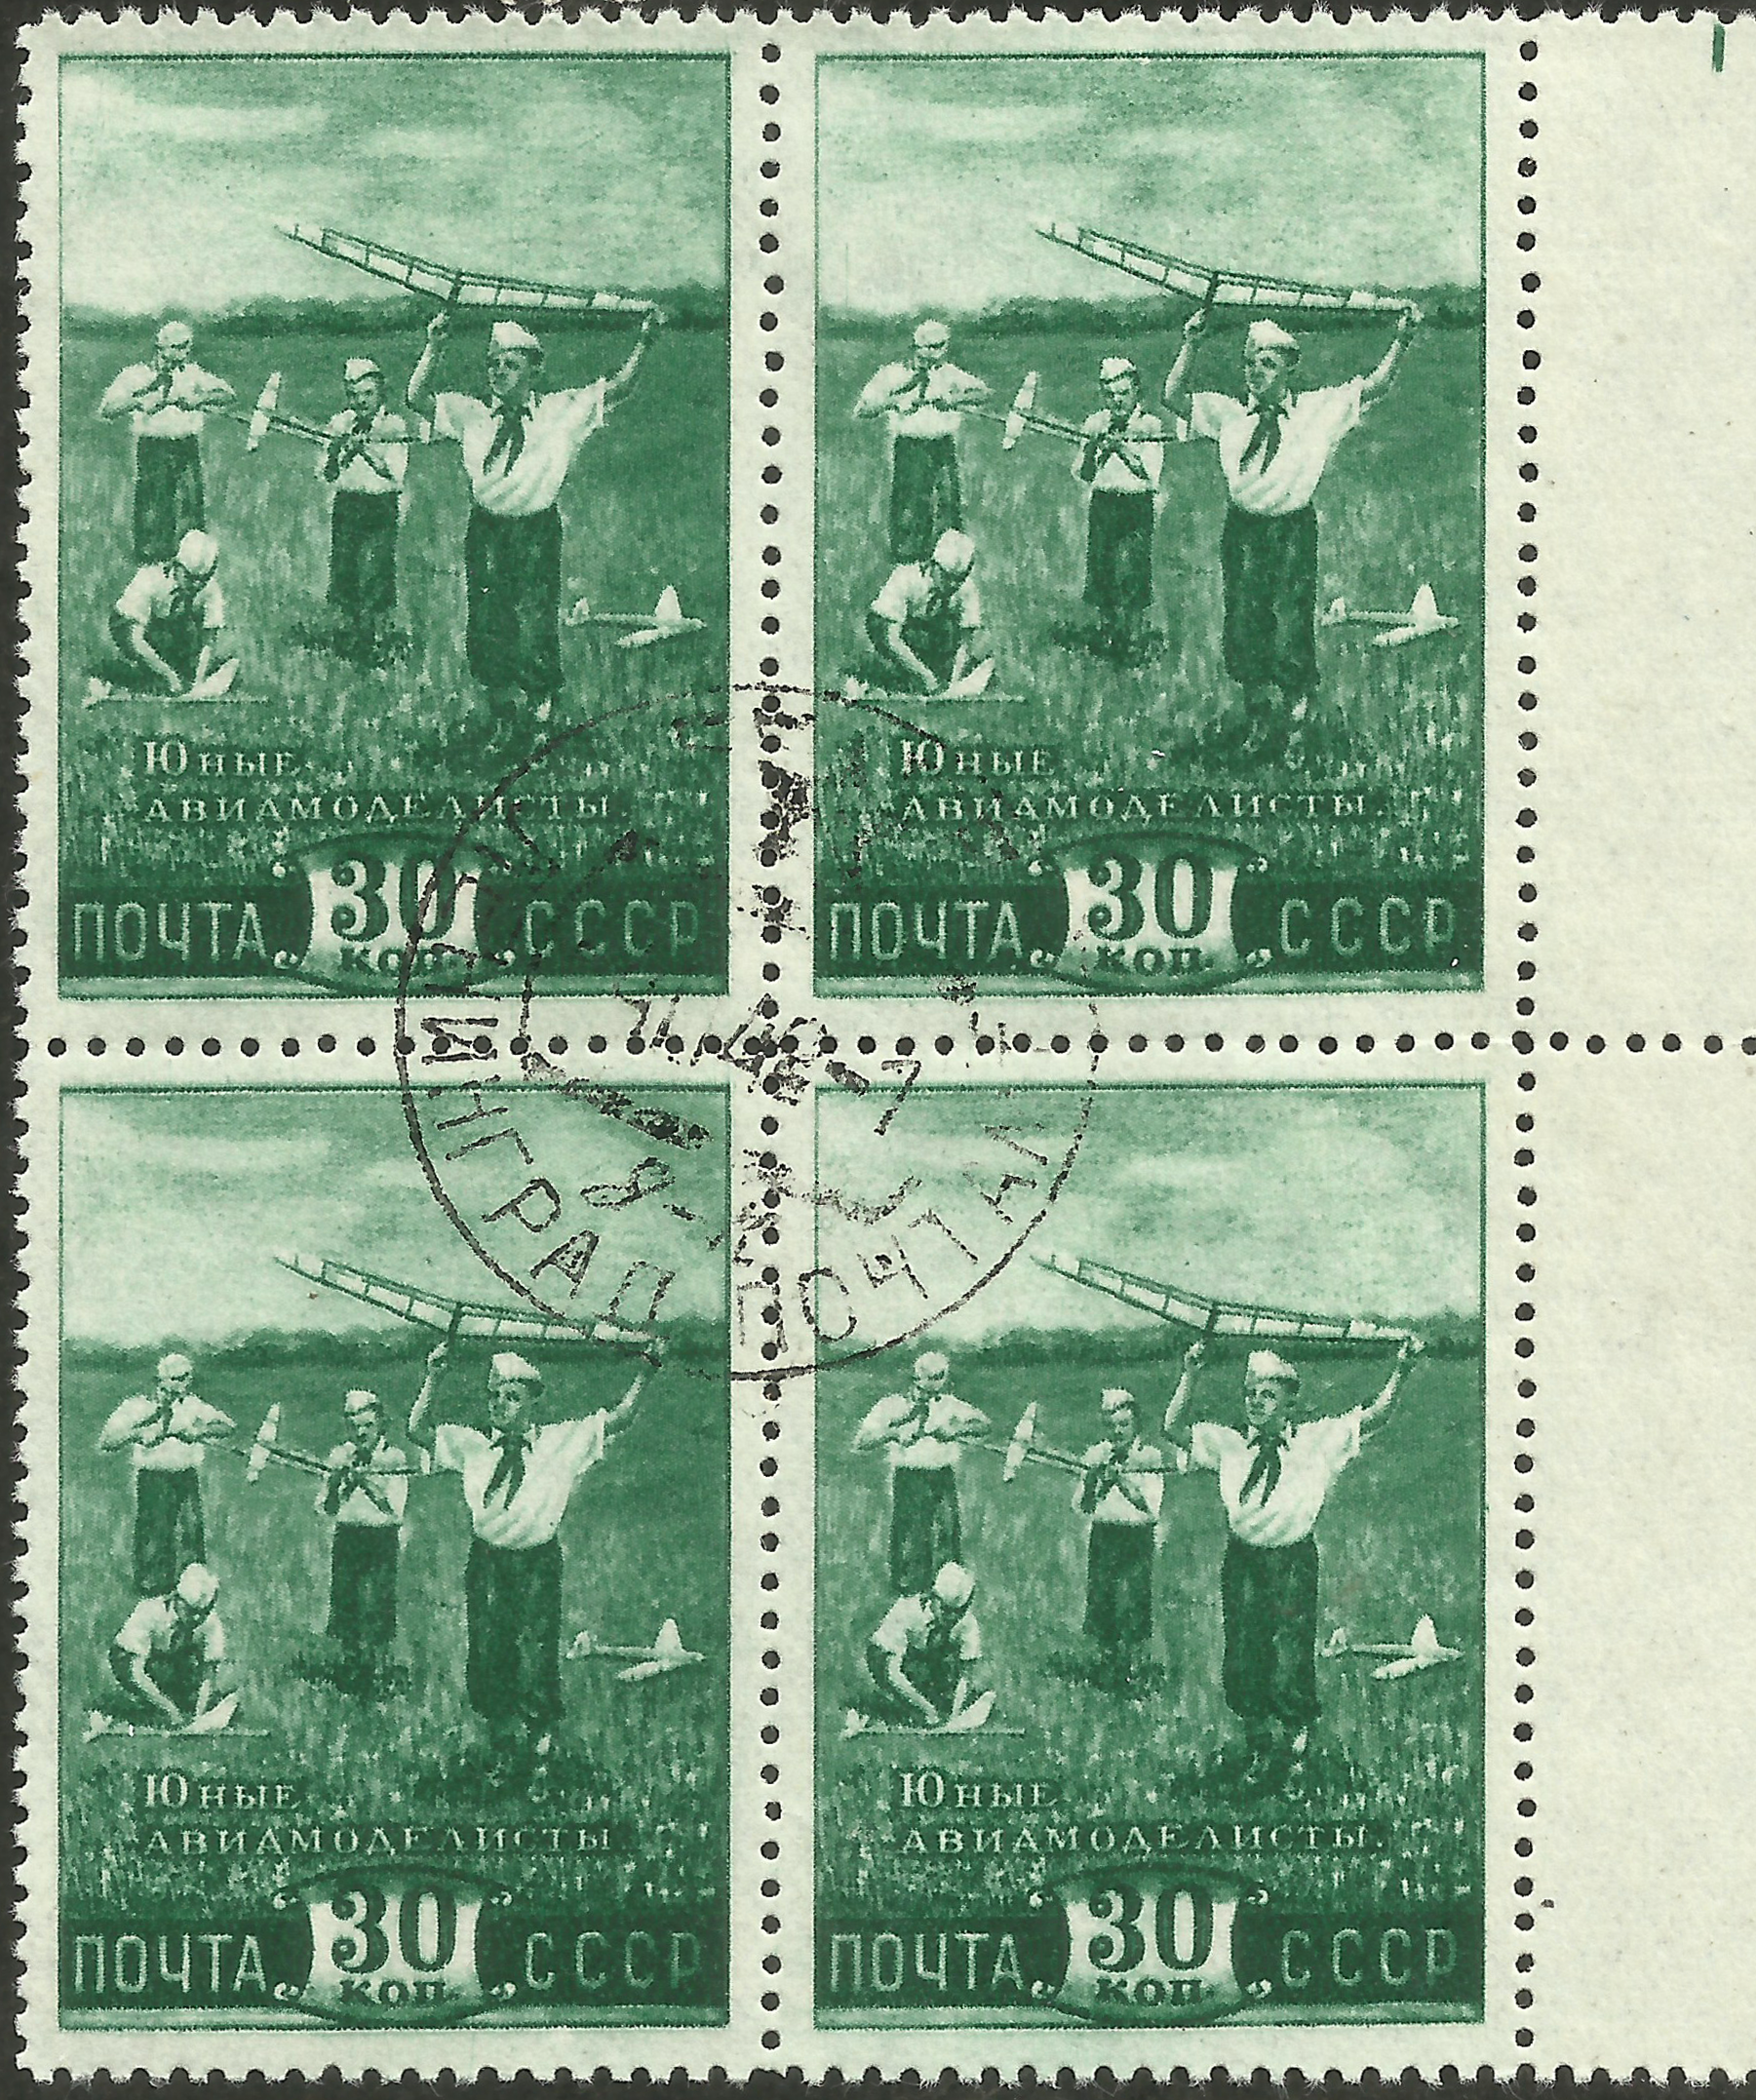 Union of Soviet Socialist Republics #1284 (1948)